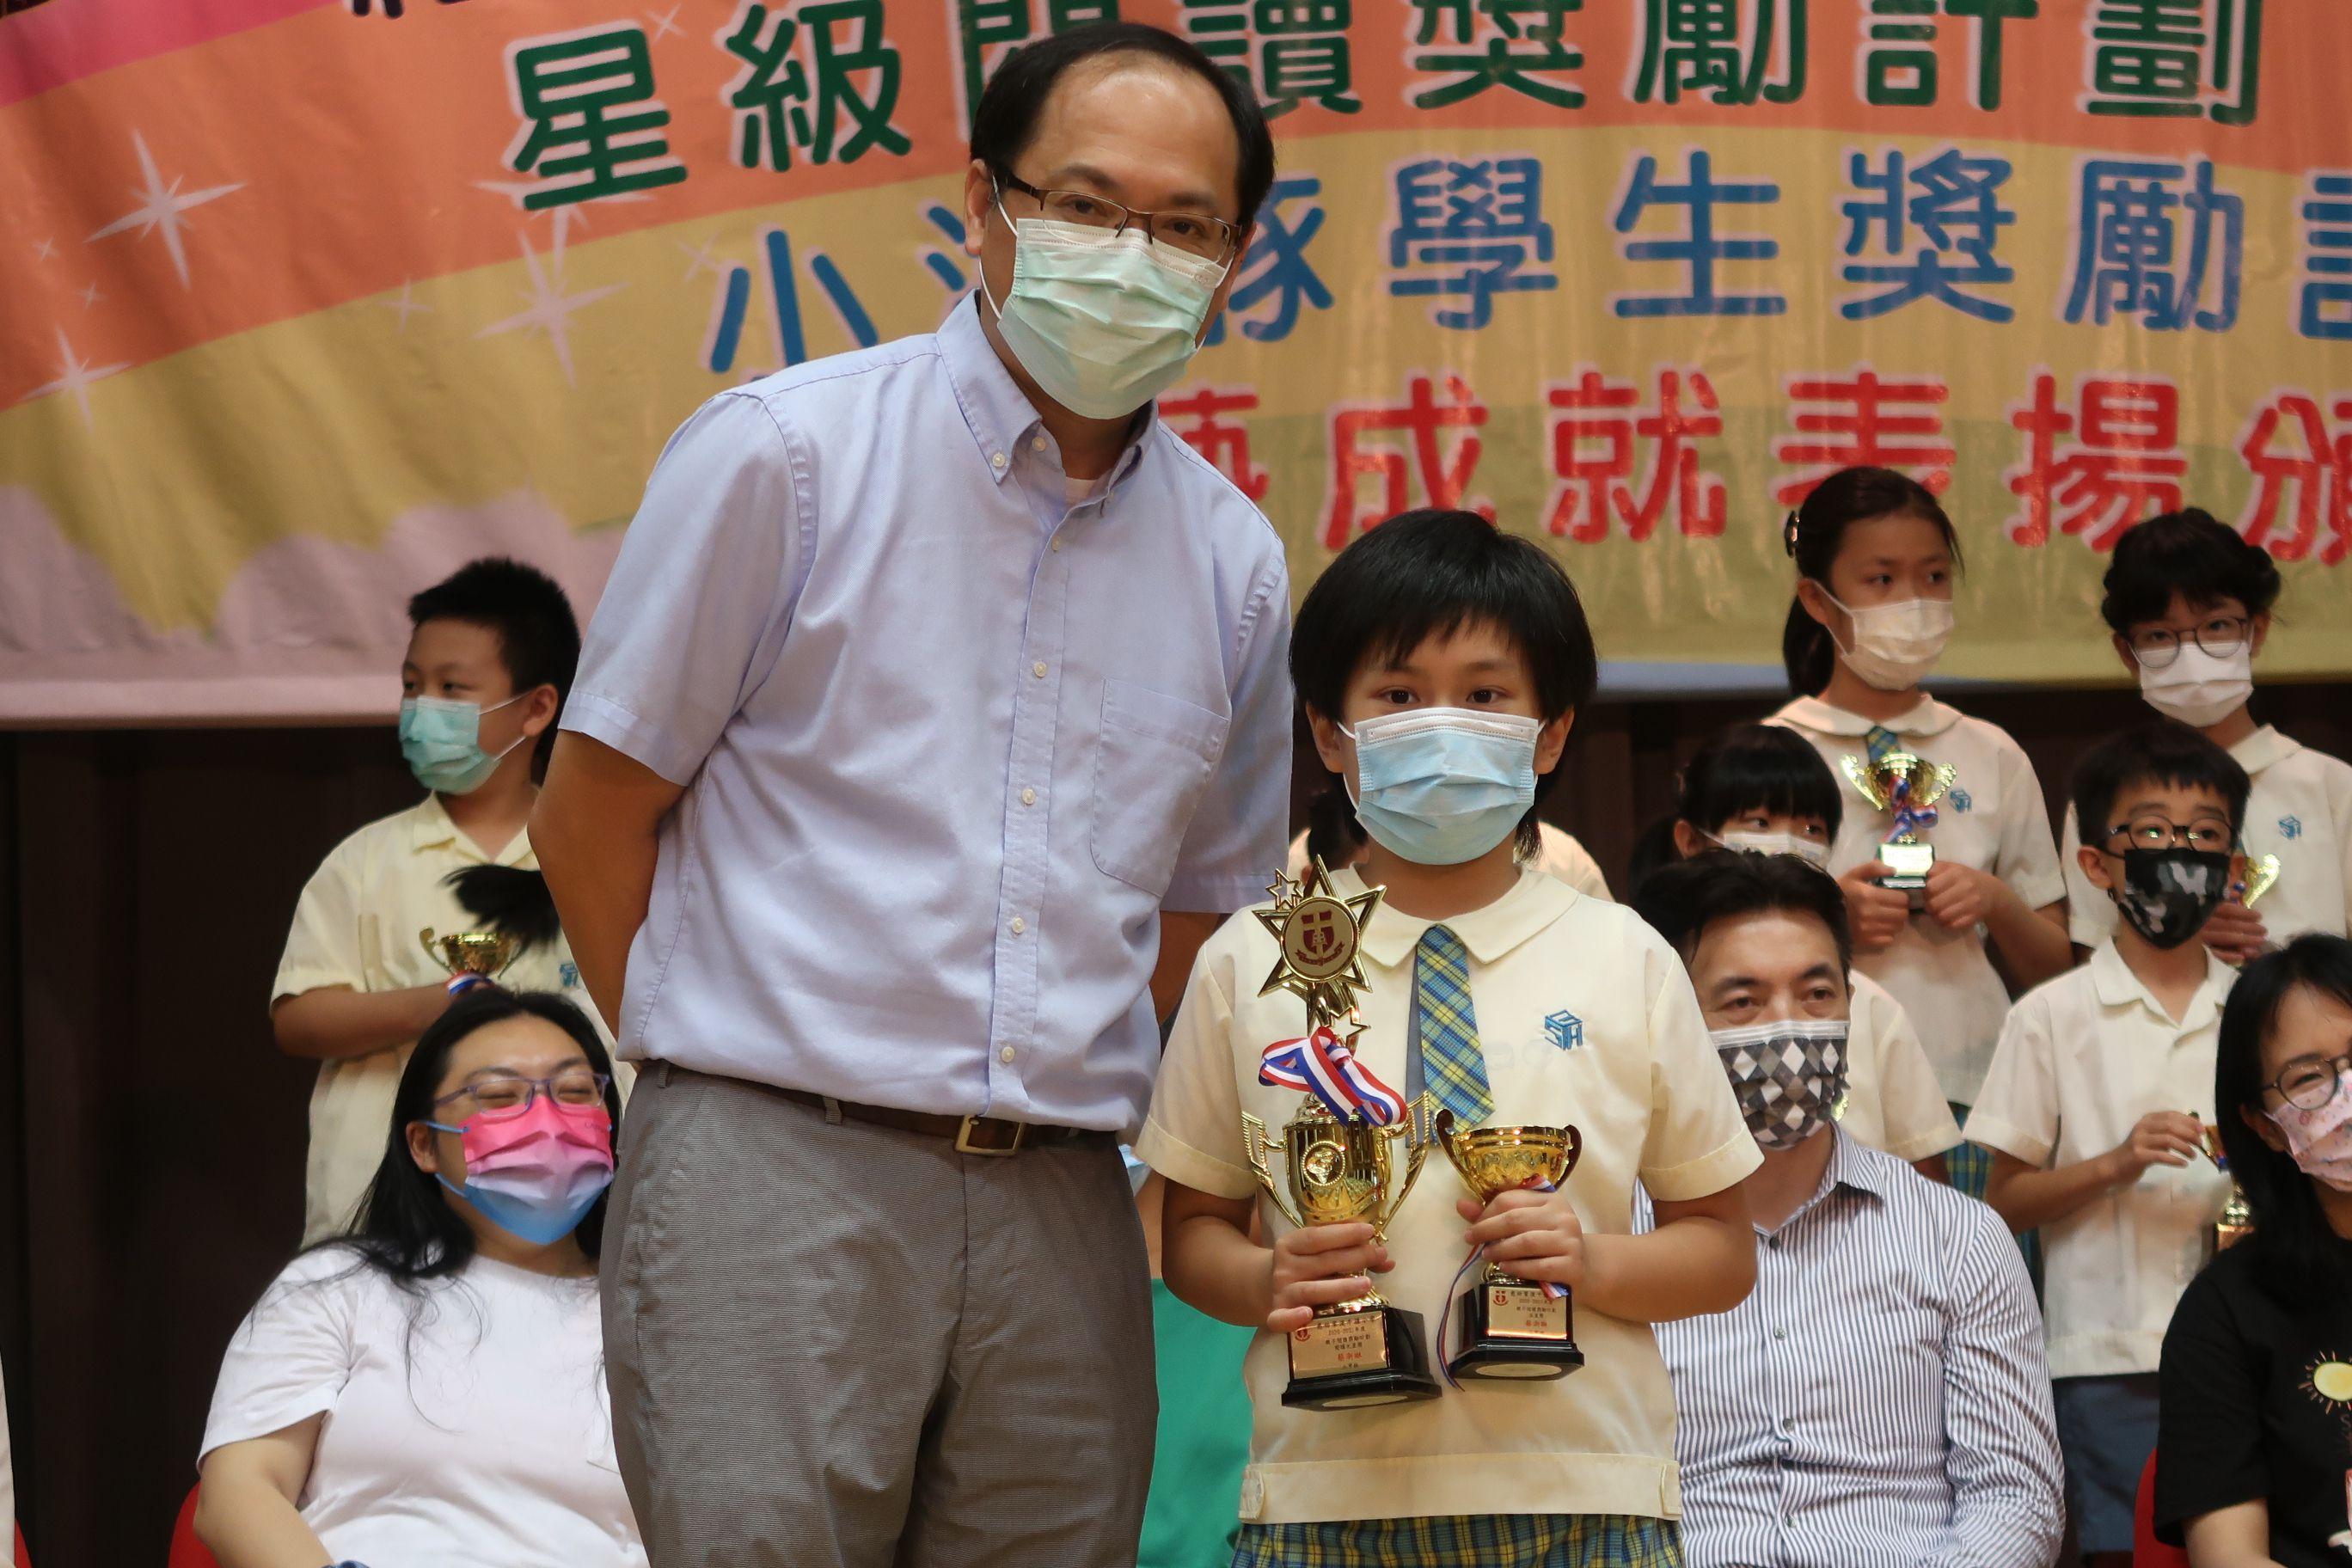 https://syh.edu.hk/sites/default/files/img_5865.jpg